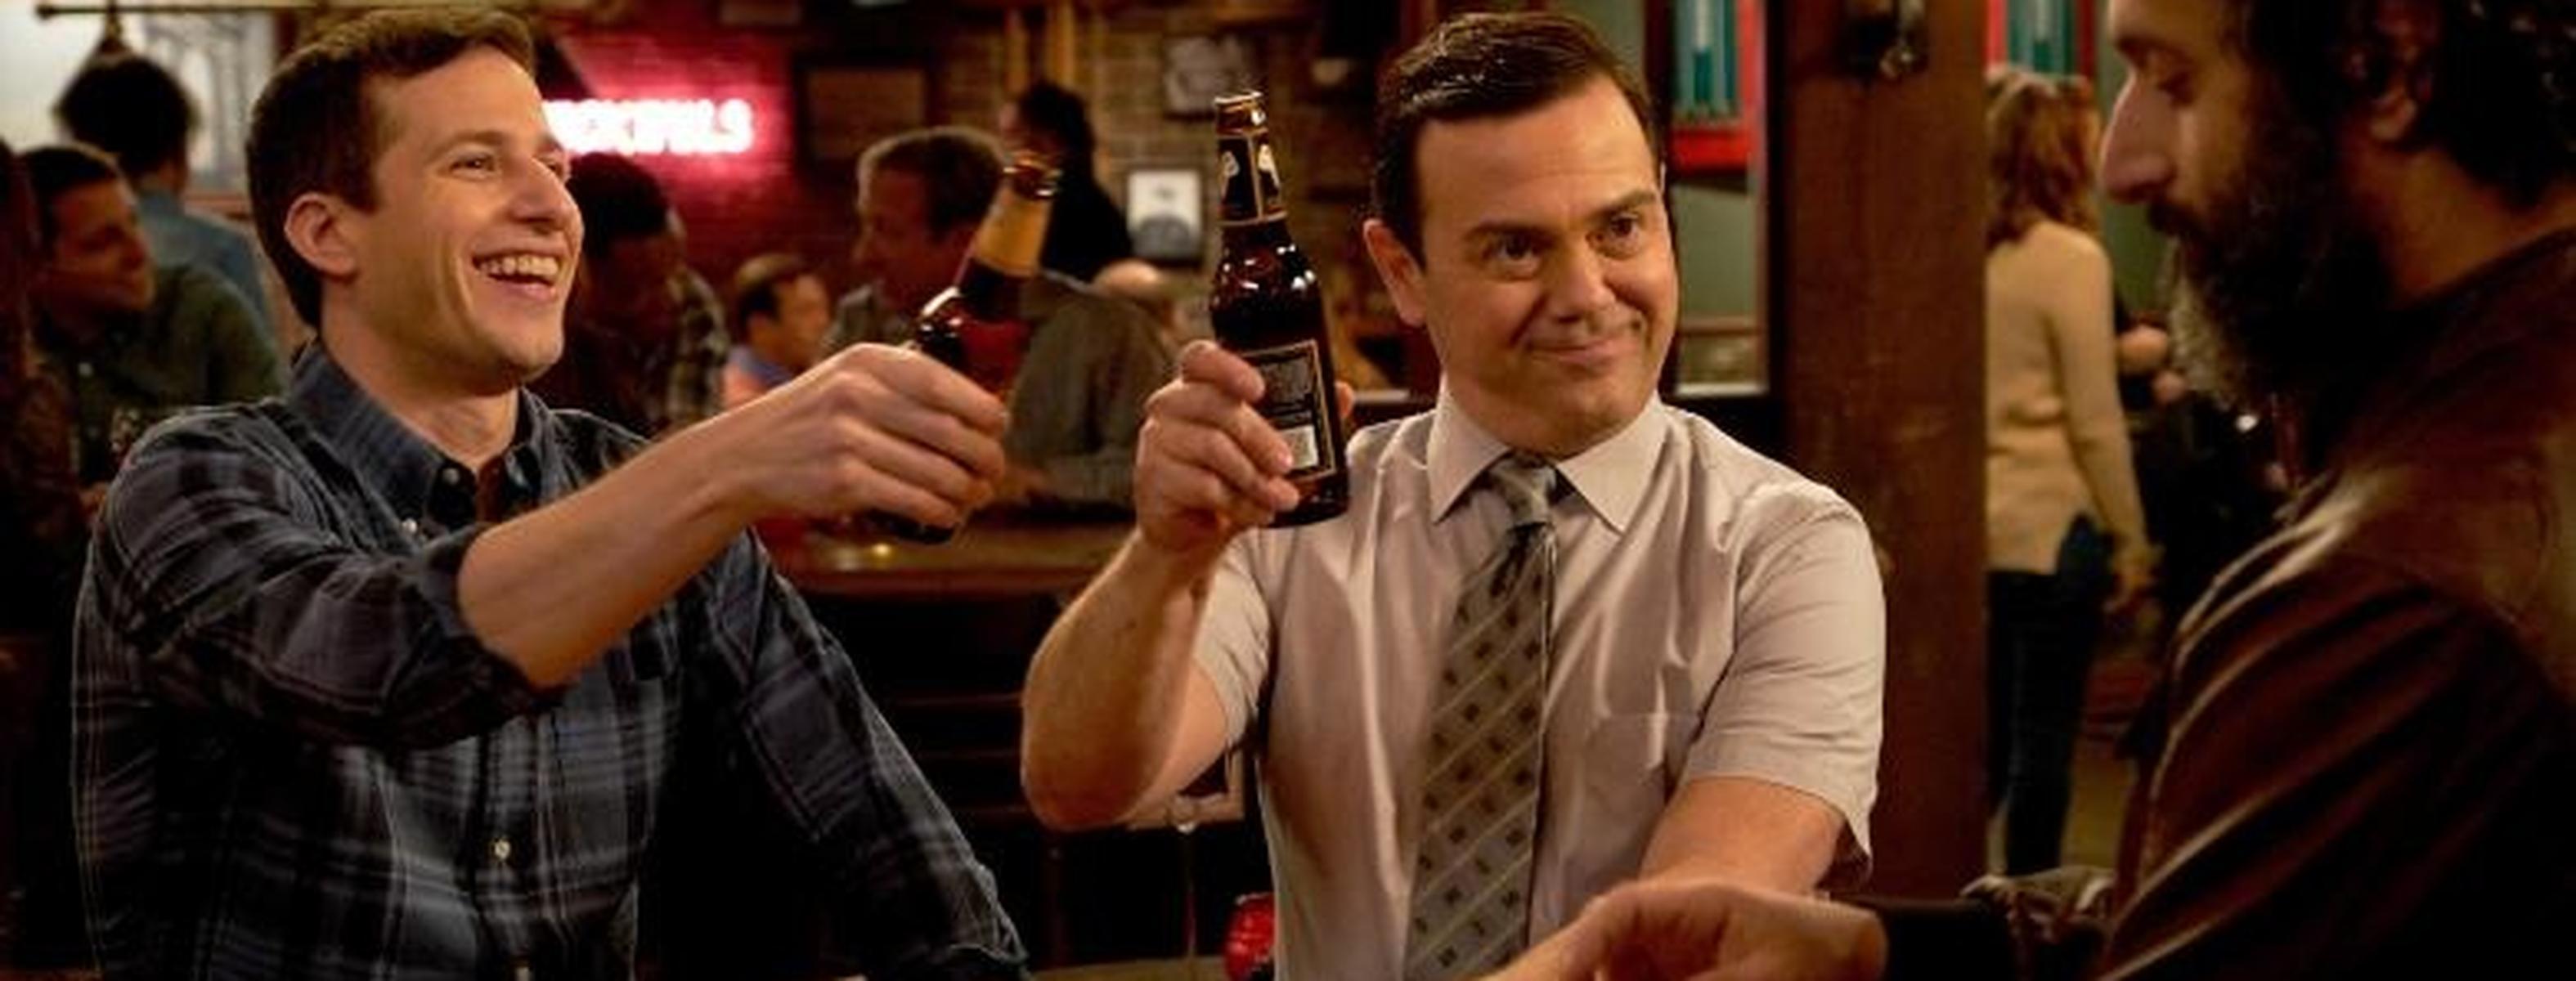 Aj monroe in the bartender